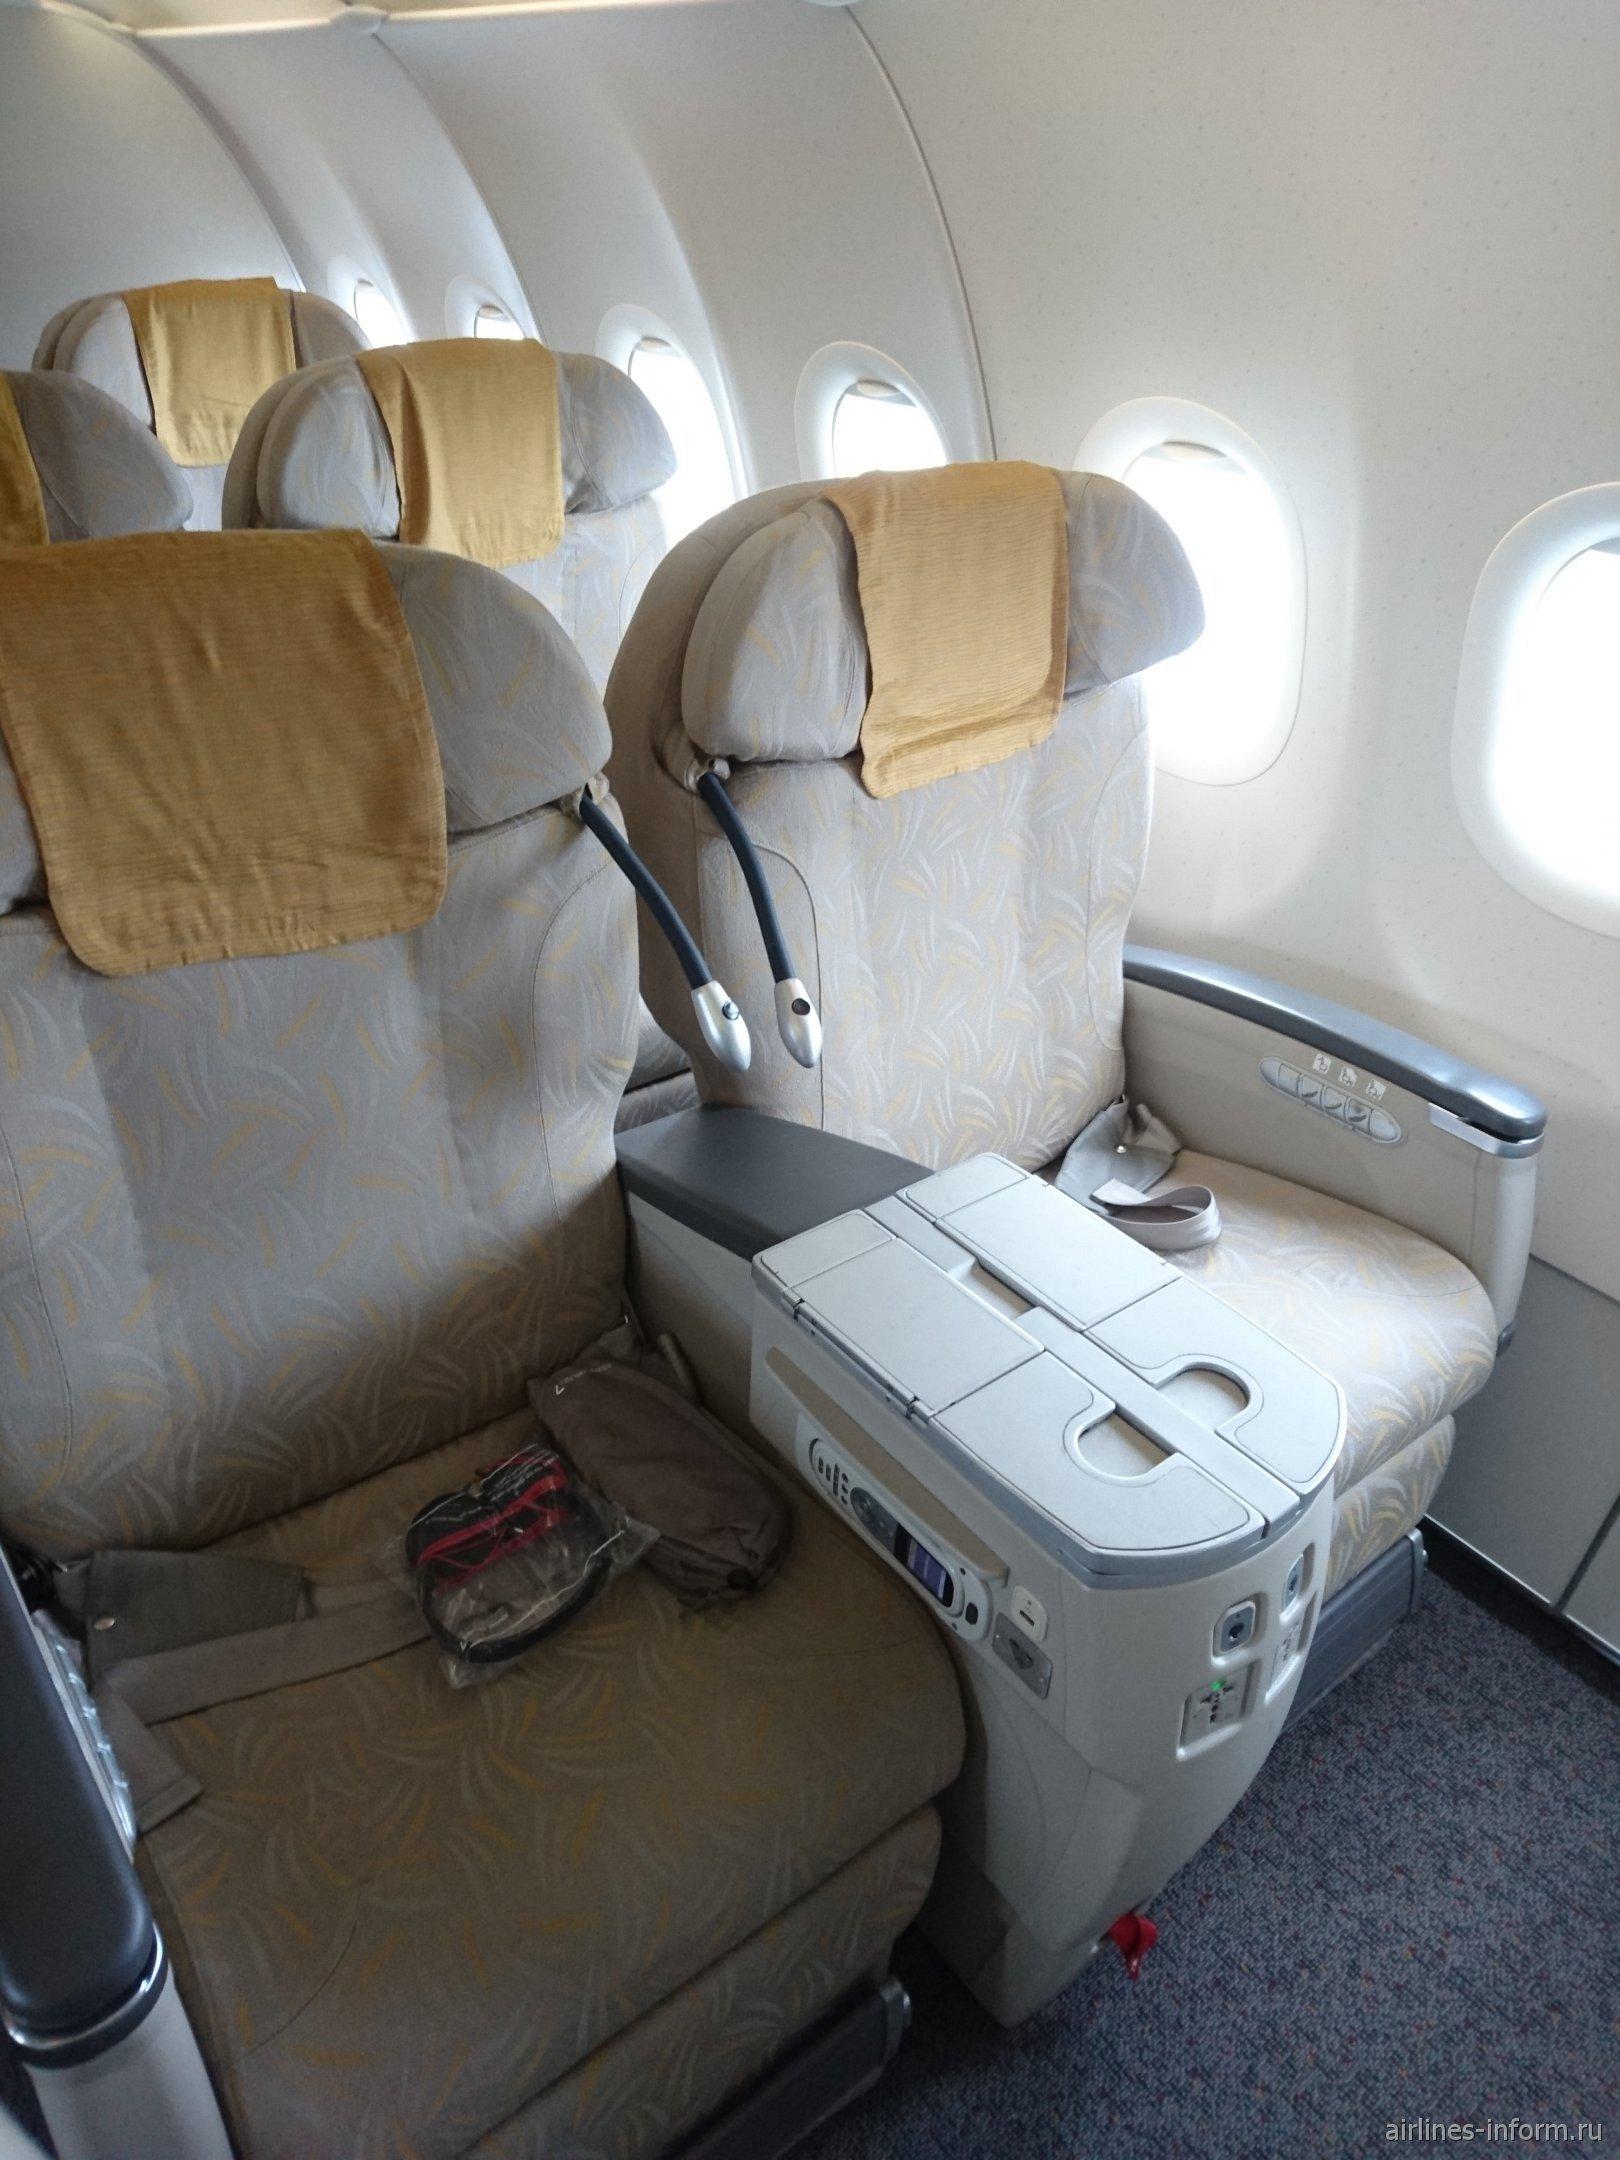 Бизнес-класс в самолете Airbus A321 авиакомпании Asiana Airlines